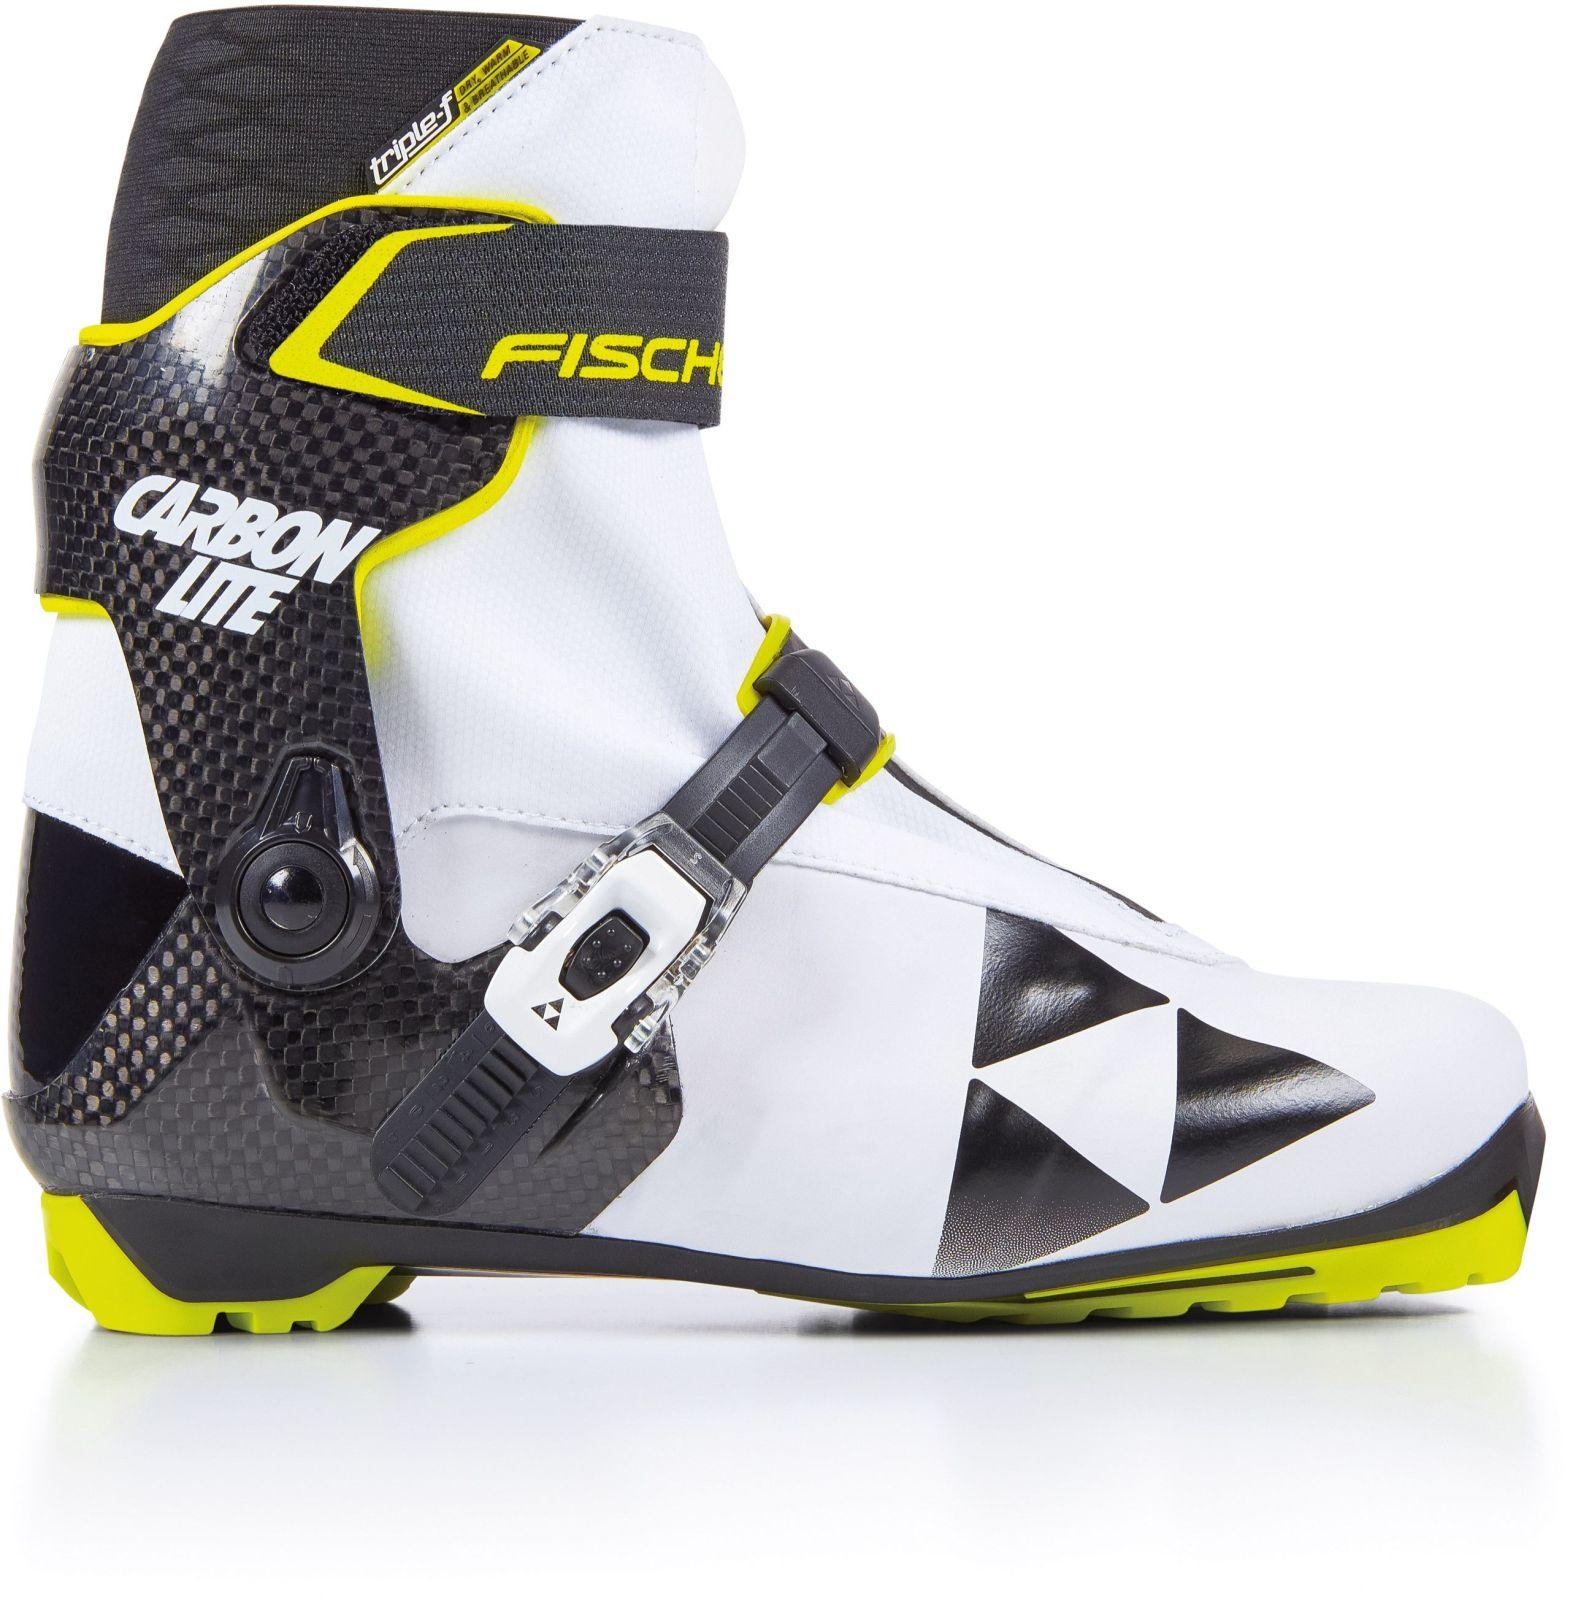 07a19196261 Dámské boty na běžky Fischer Carbonlite Skate Ws - Ski a Bike ...